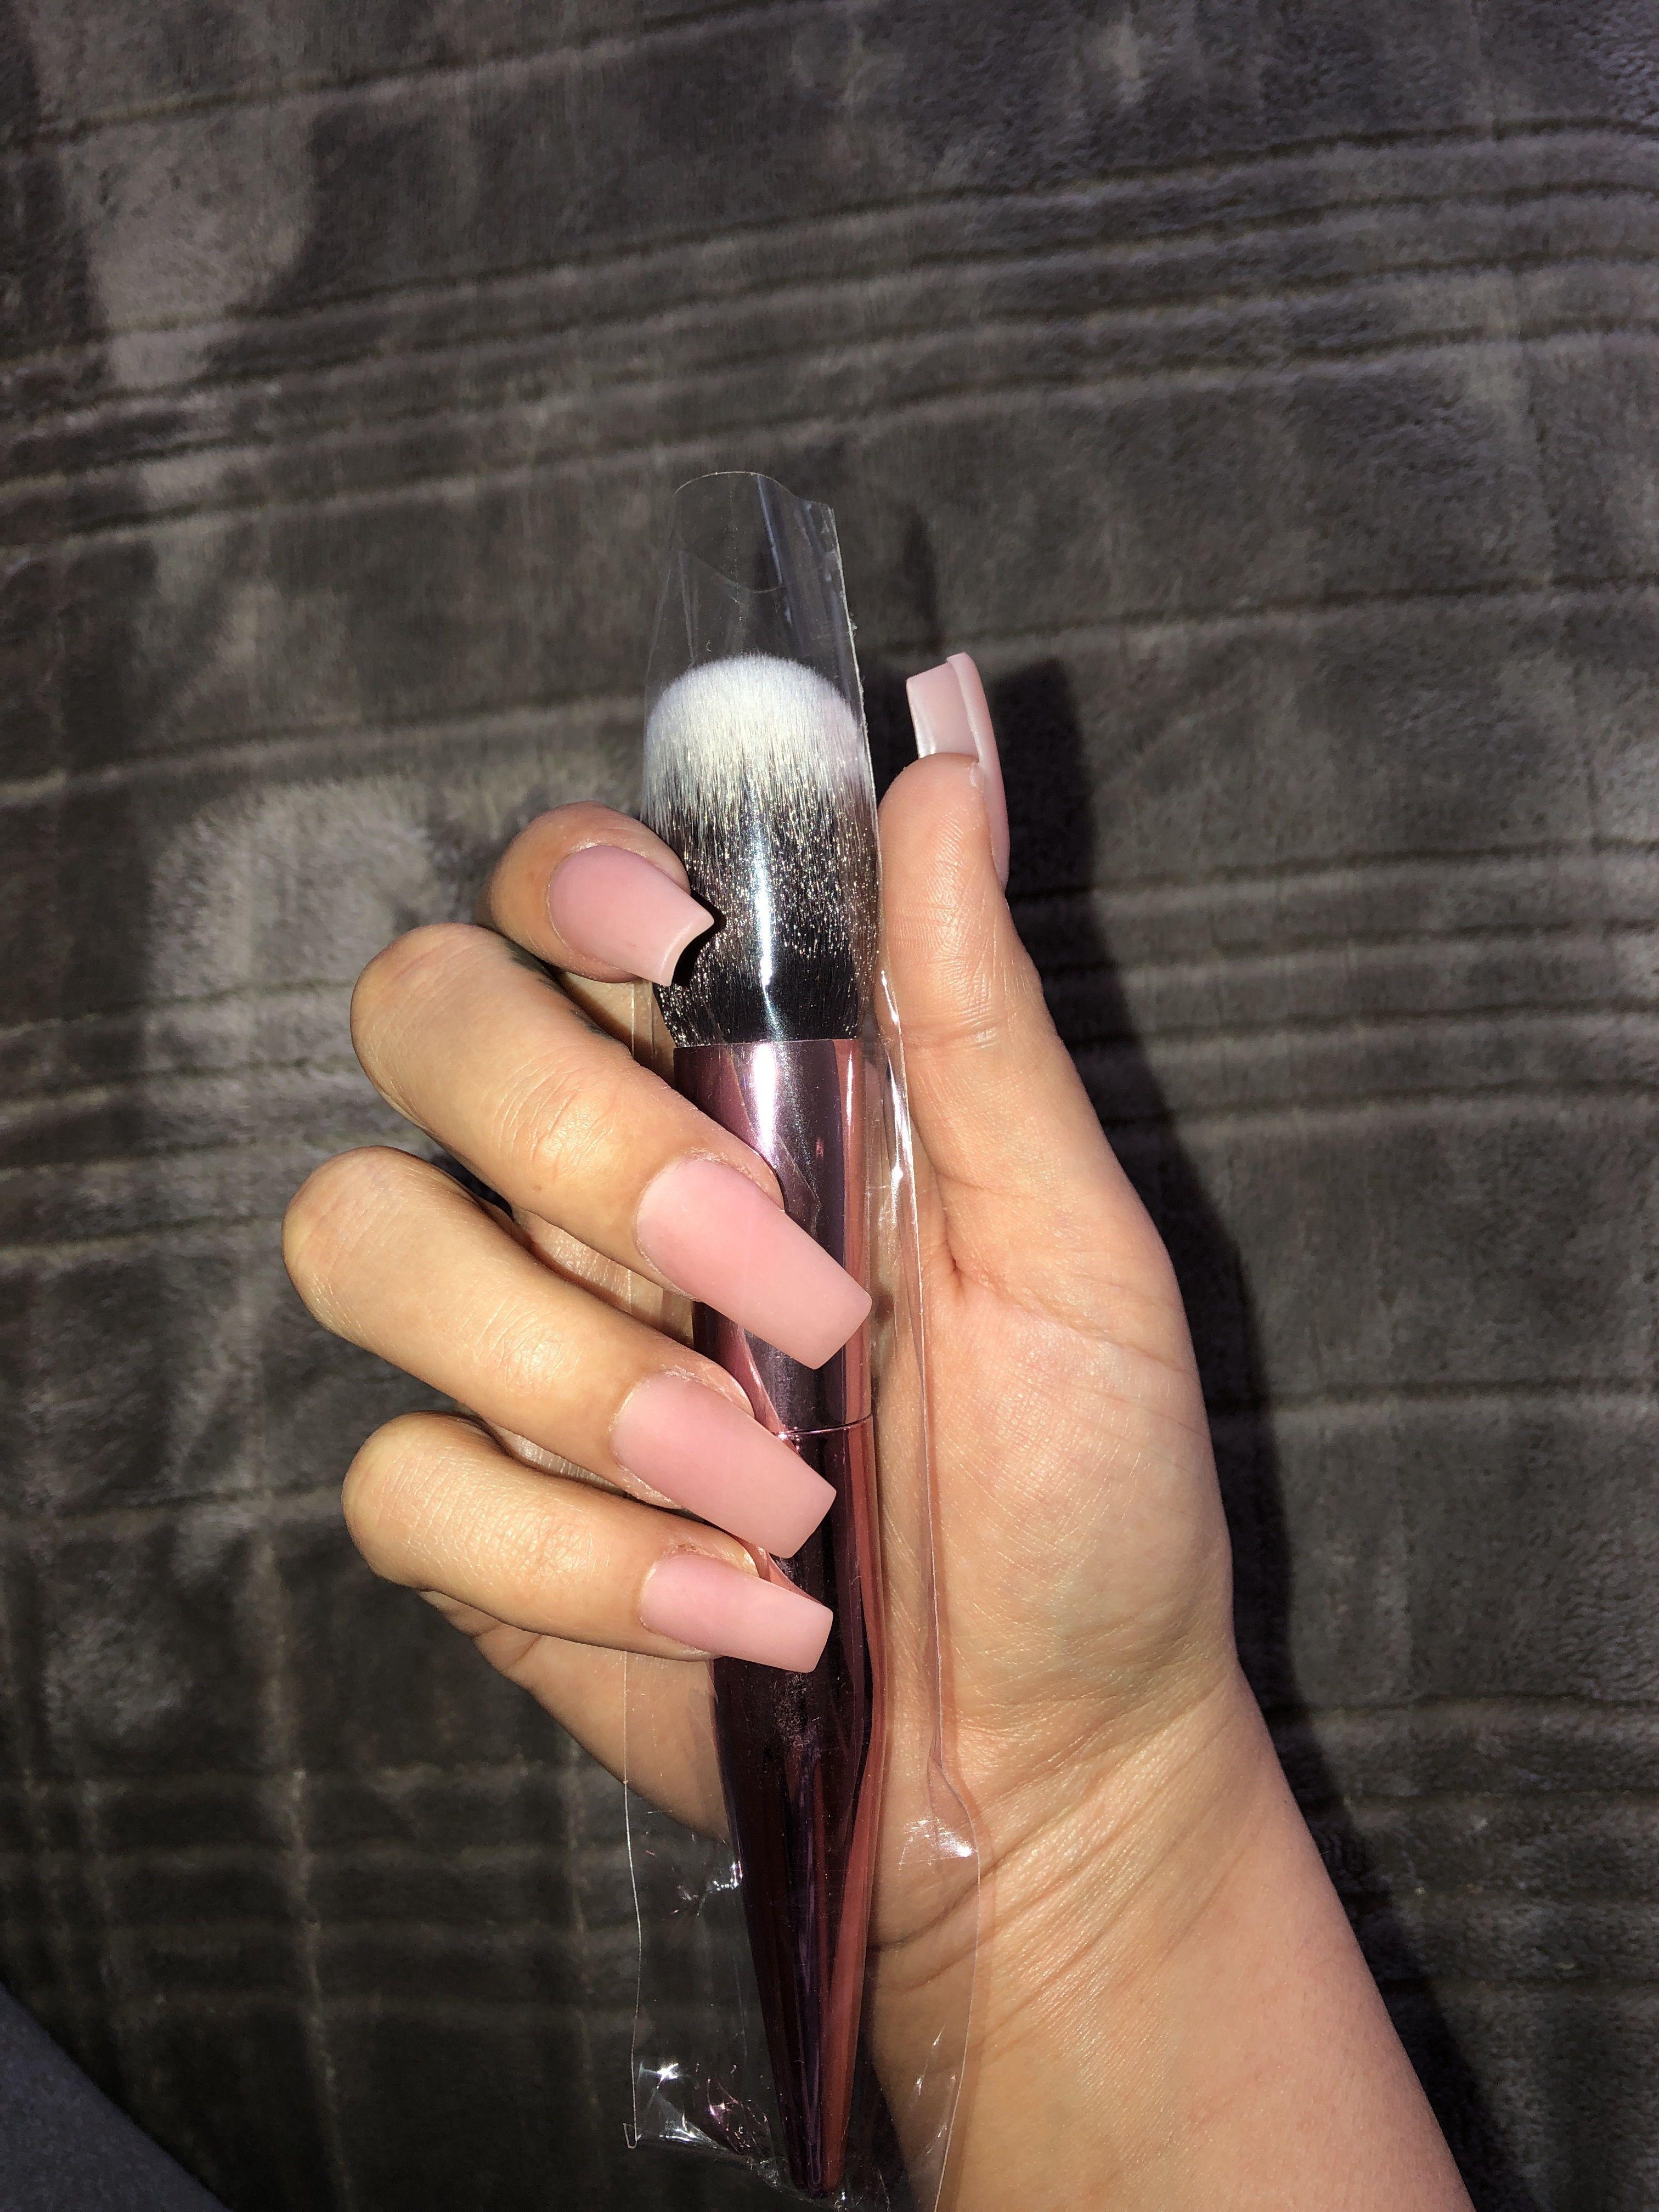 Pink Acrylic Powder Clear Matte Gel Top Coat No Polish Skinny Square Shape Medium Length Cute Acrylic Nails Matte Gel Square Nails